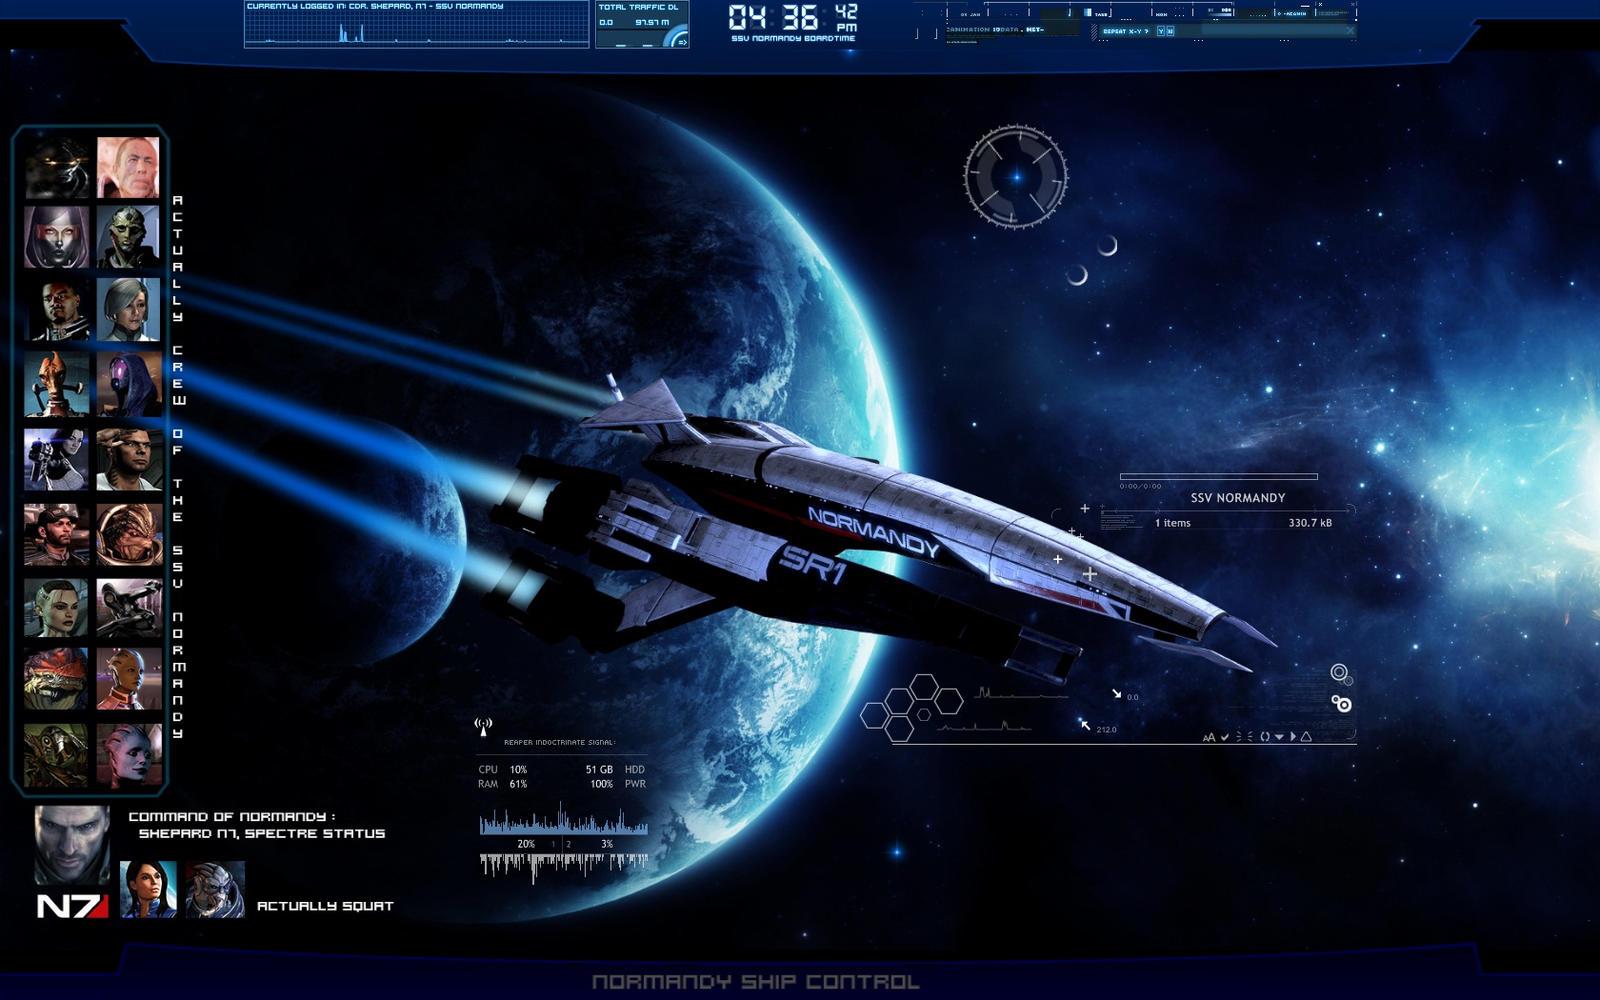 Gmail theme anime - Ijoemski 10 2 Mass Effect Desktop By Saka88bln